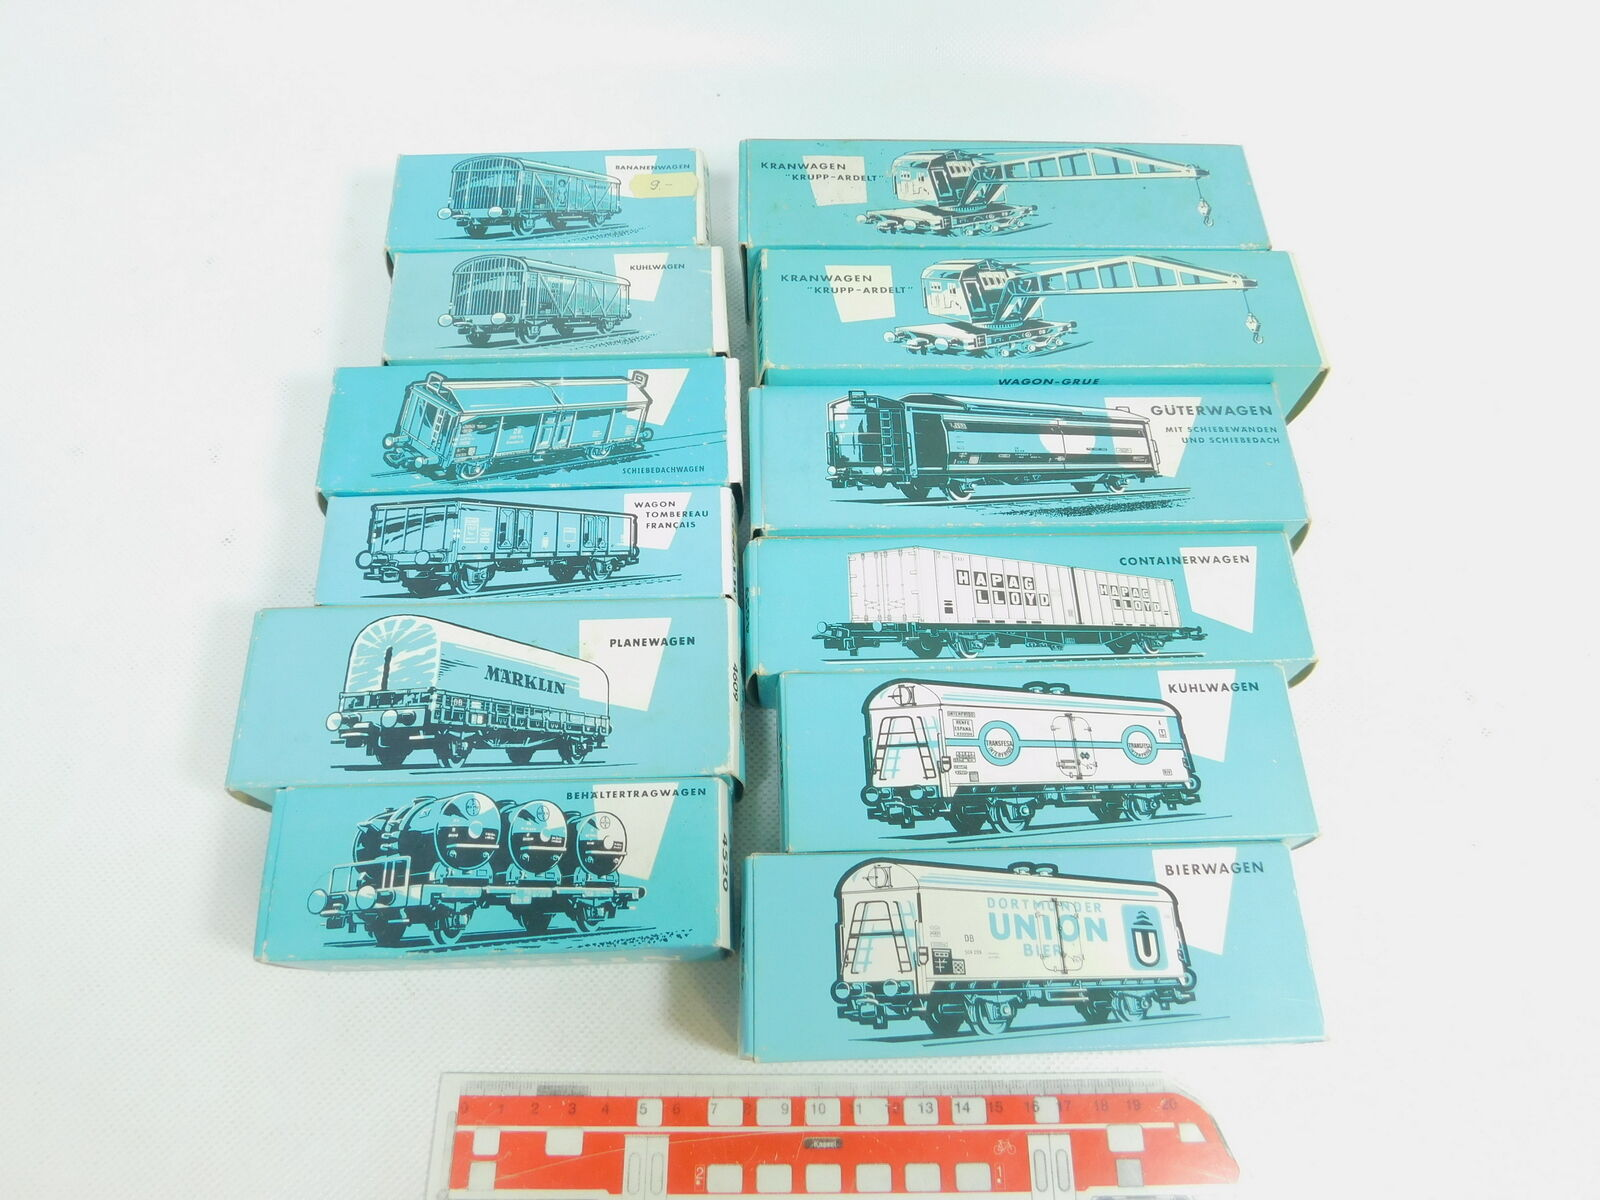 Bm455-1  12x märklin h0 empty box   4508+4509+4520+4609 + 4611+4619+4623+4633  pas de taxes